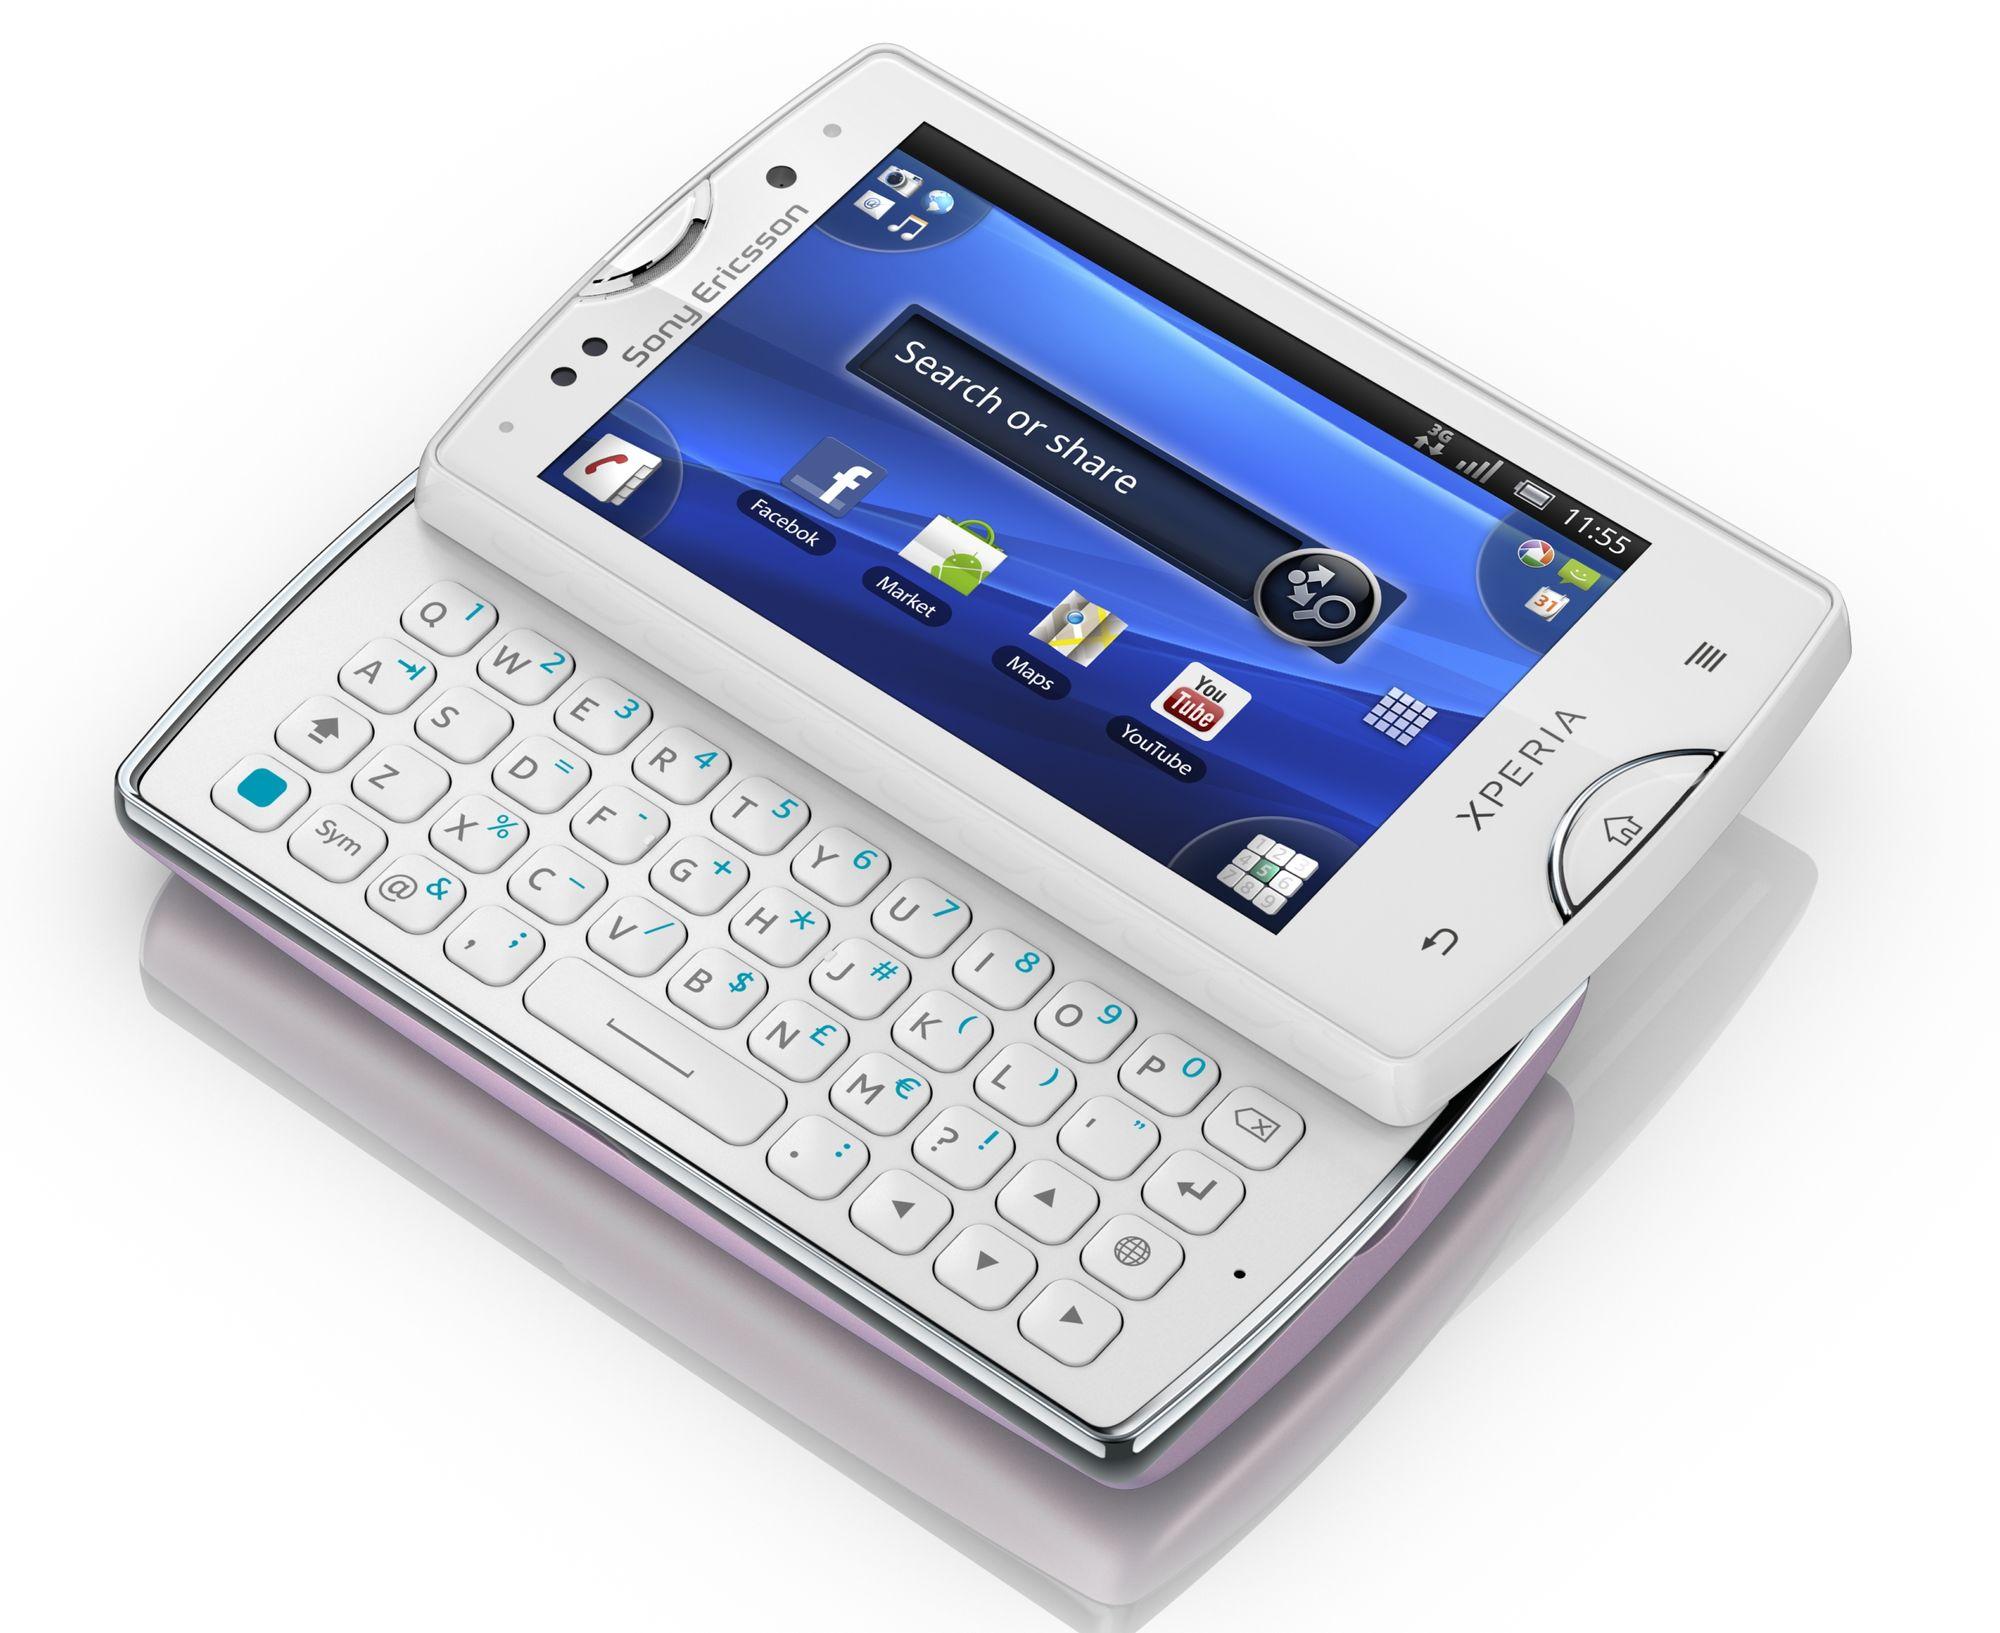 Xperia X10 mini pro har blitt en liten tanke st  248 rre enn forgjengeren Xperia Mini White